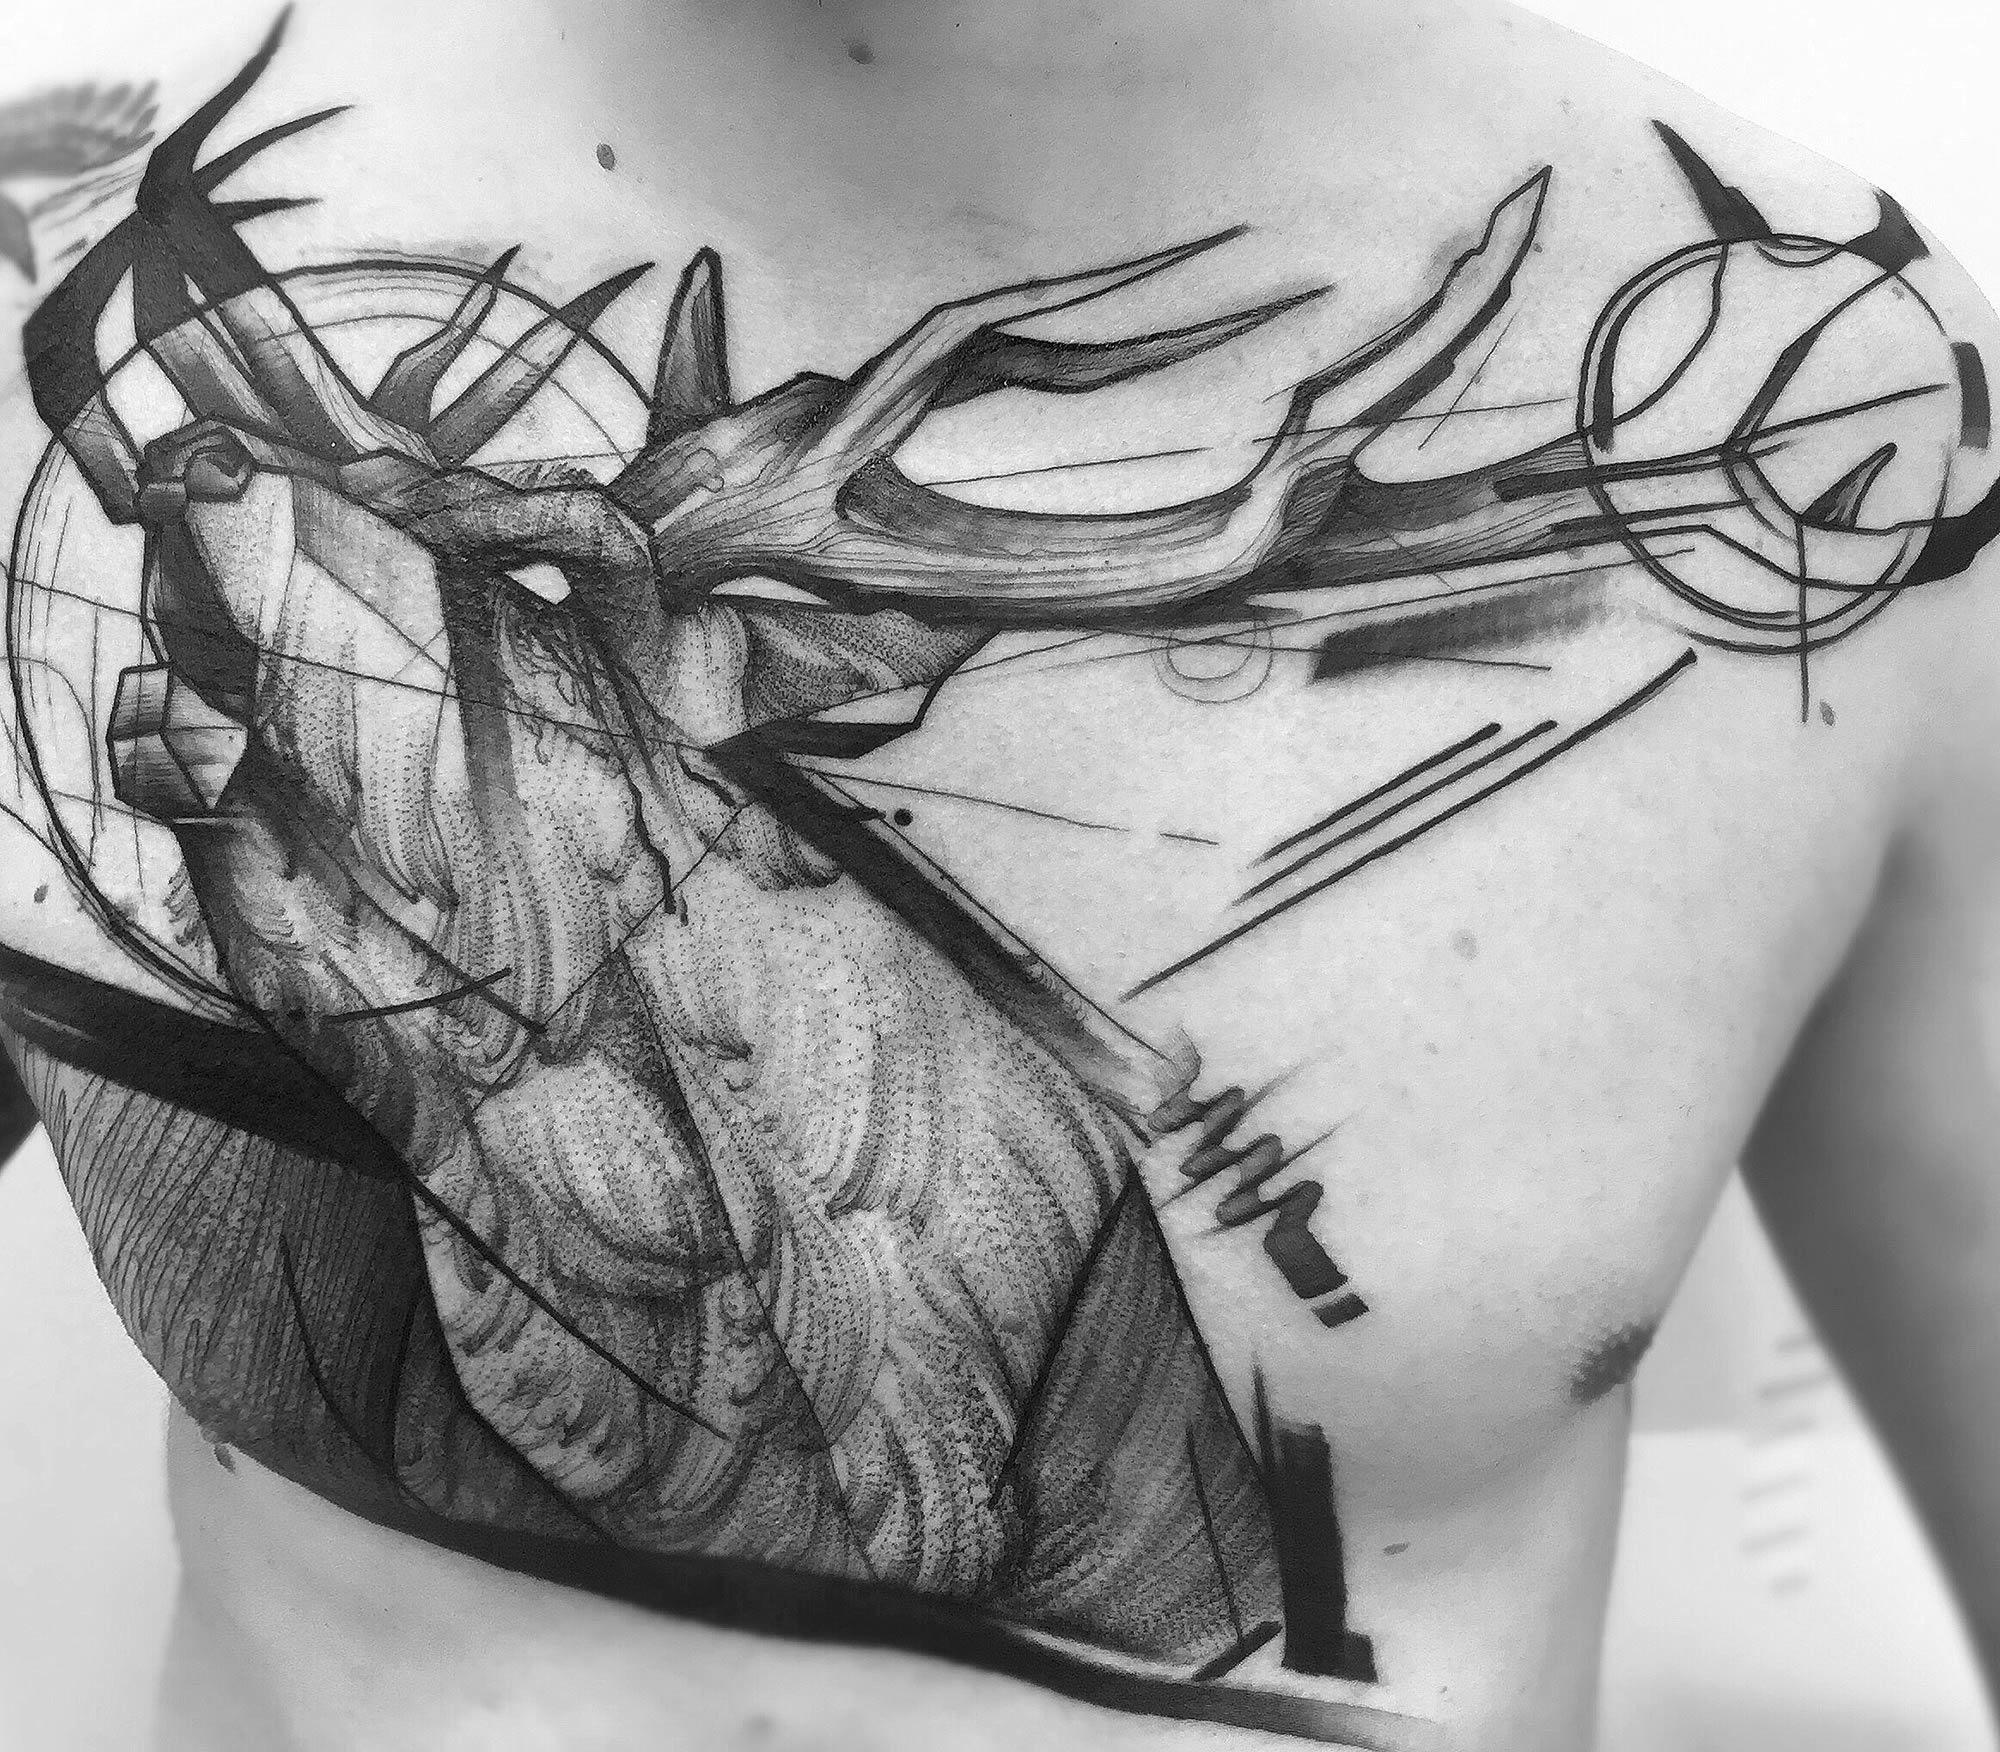 10 Best Tattoo Artists Of 2016 Editor S Picks Sketch Style Tattoos Cool Tattoos Tattoo Artists